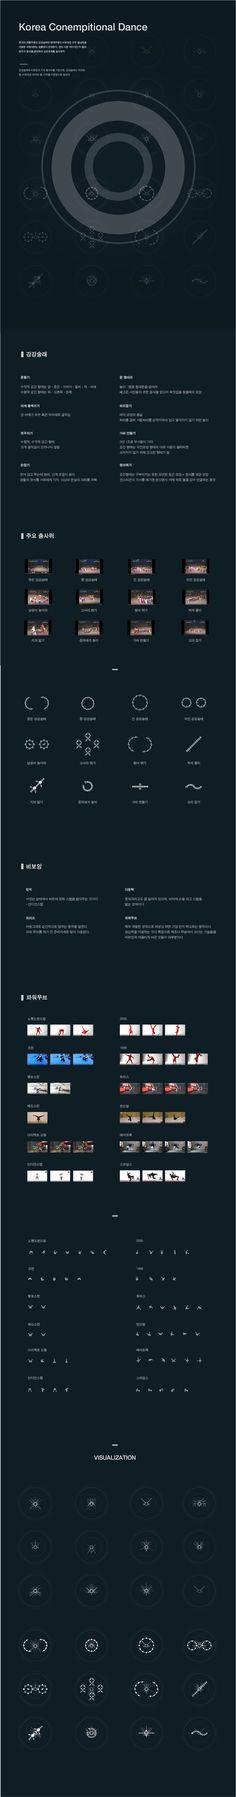 Jeong GyeongMin | Korea Contempitional Dance (contemporary + traditional) | Information Visualization 2016│ Major in Digital Media Design │#hicoda │hicoda.hongik.ac.kr